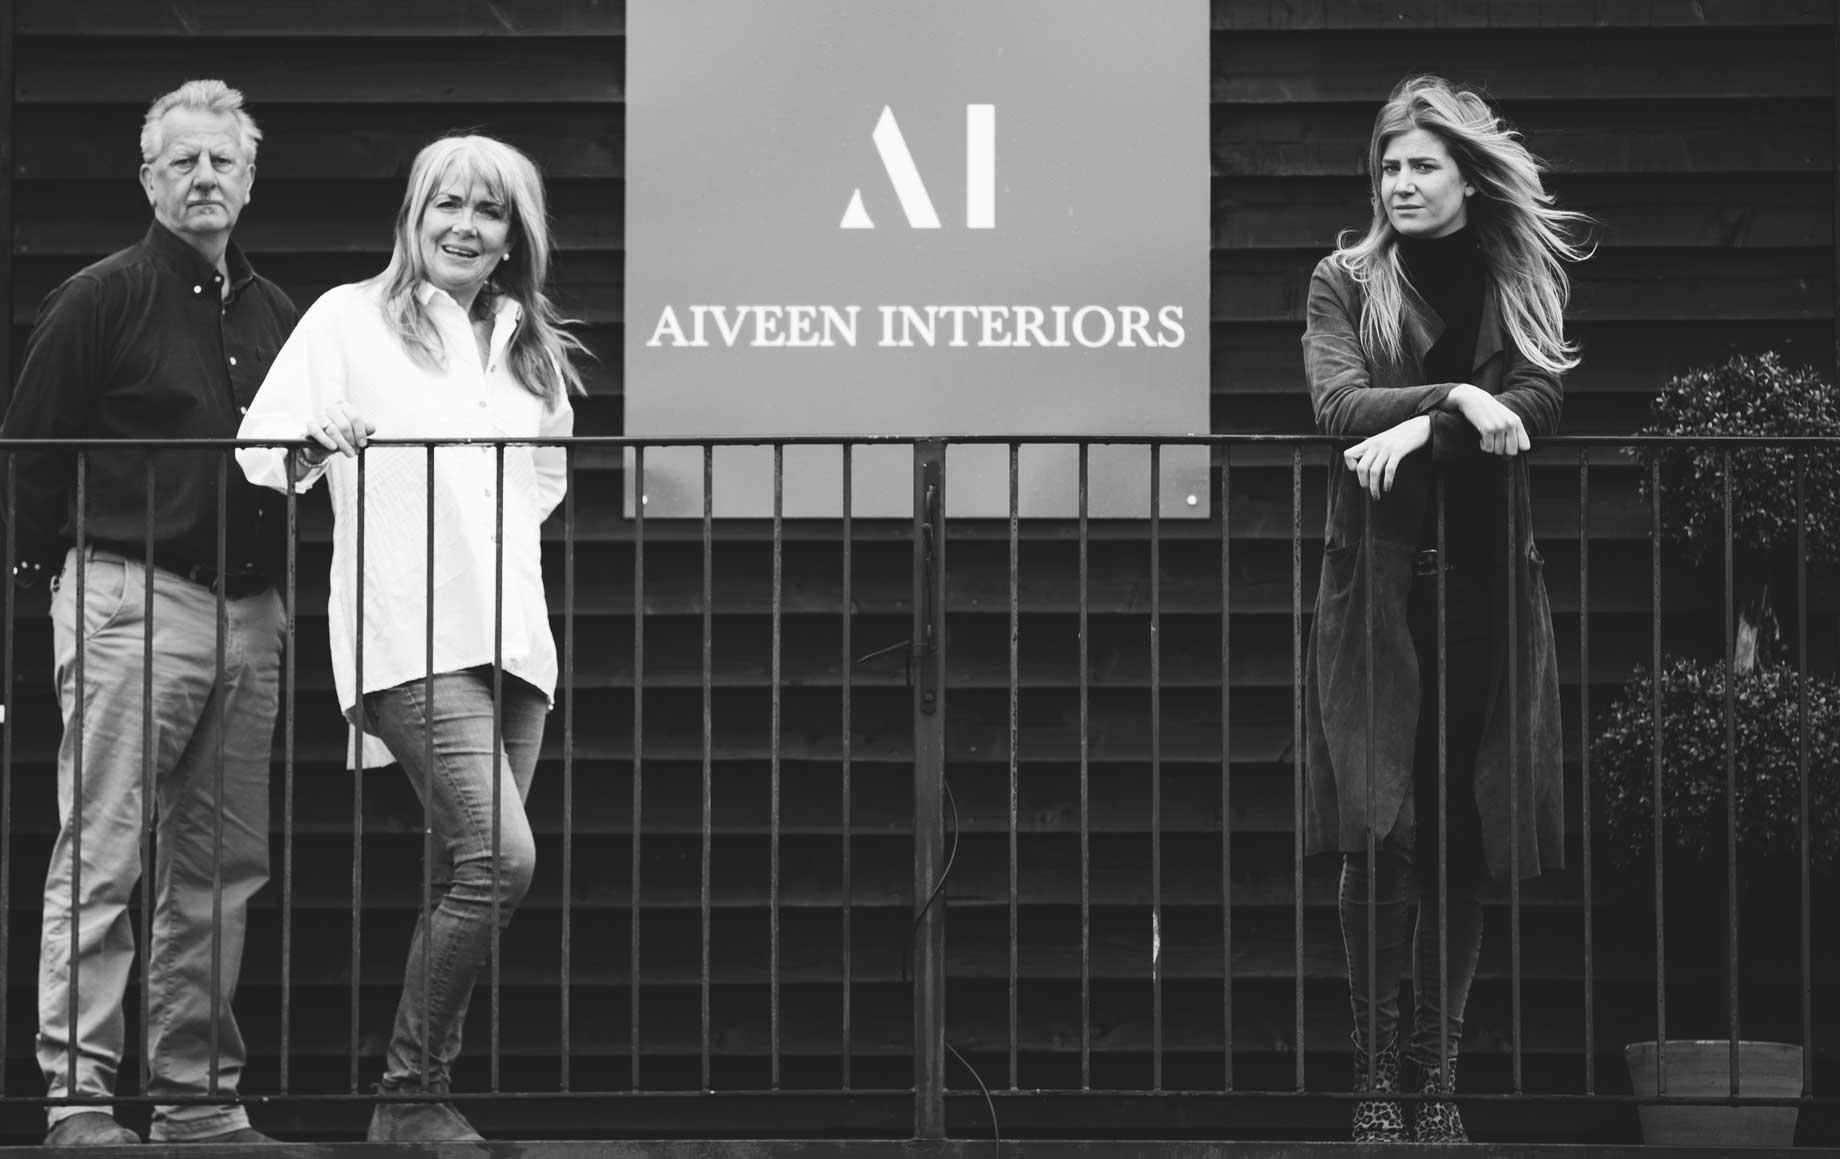 Aiveen-interiors-Contact